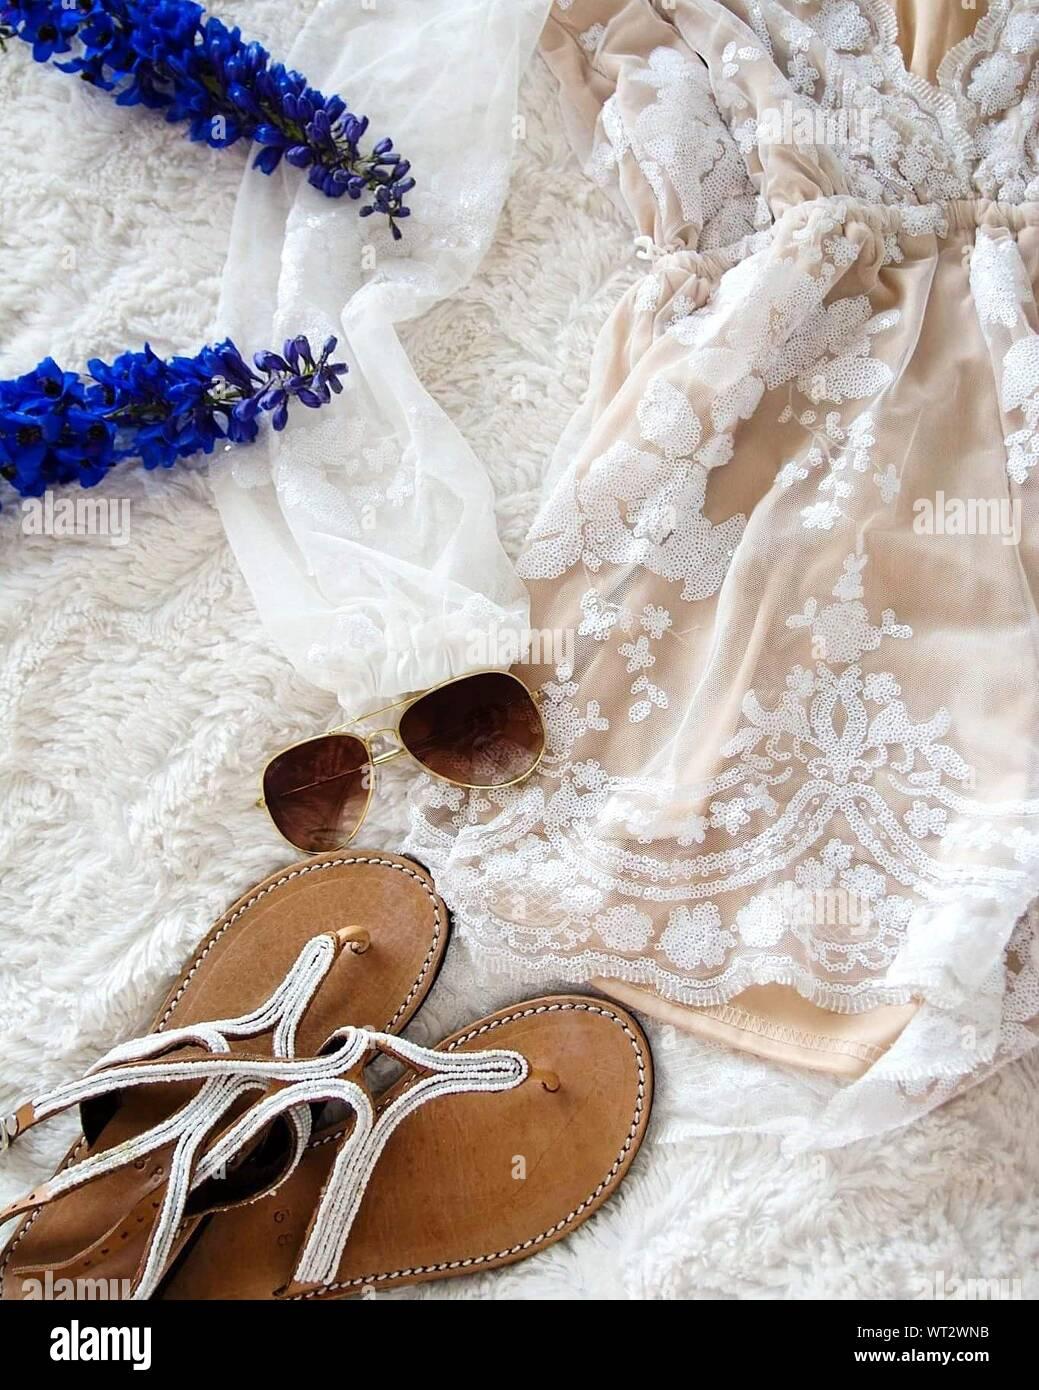 Sandals And Sunglasses On Wedding Dress Stock Photo Alamy,Wedding Dresses For Mens In Sri Lanka